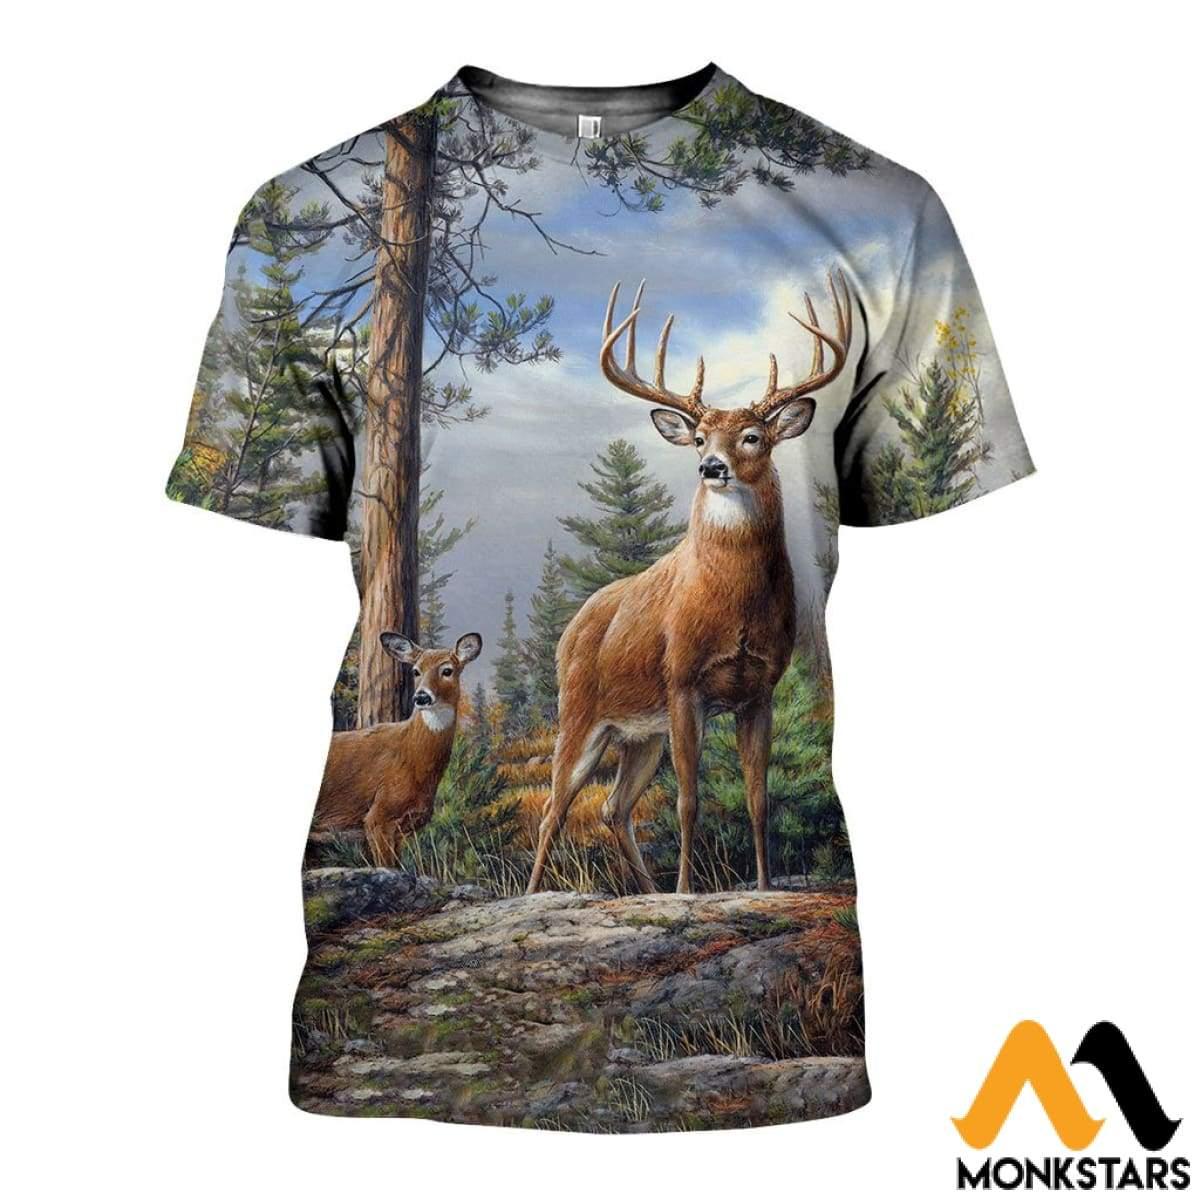 3d Over Printed Deer Art Shirts And Shorts - Monkstars